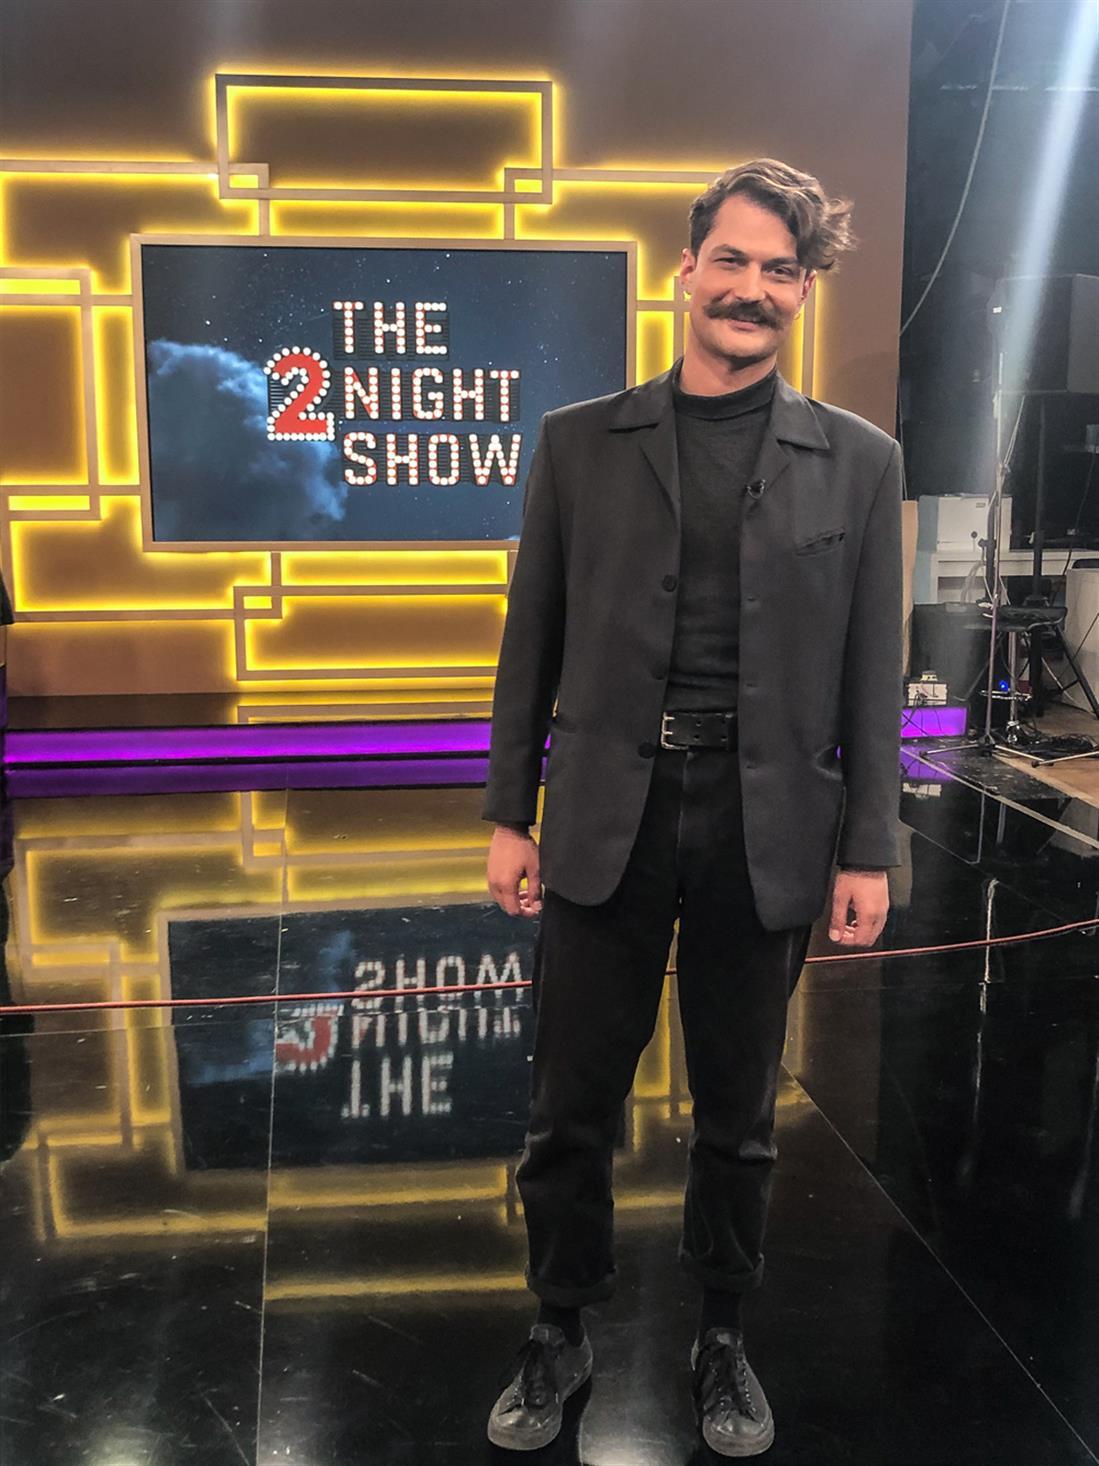 The 2Night Show - Καμιτσάκης